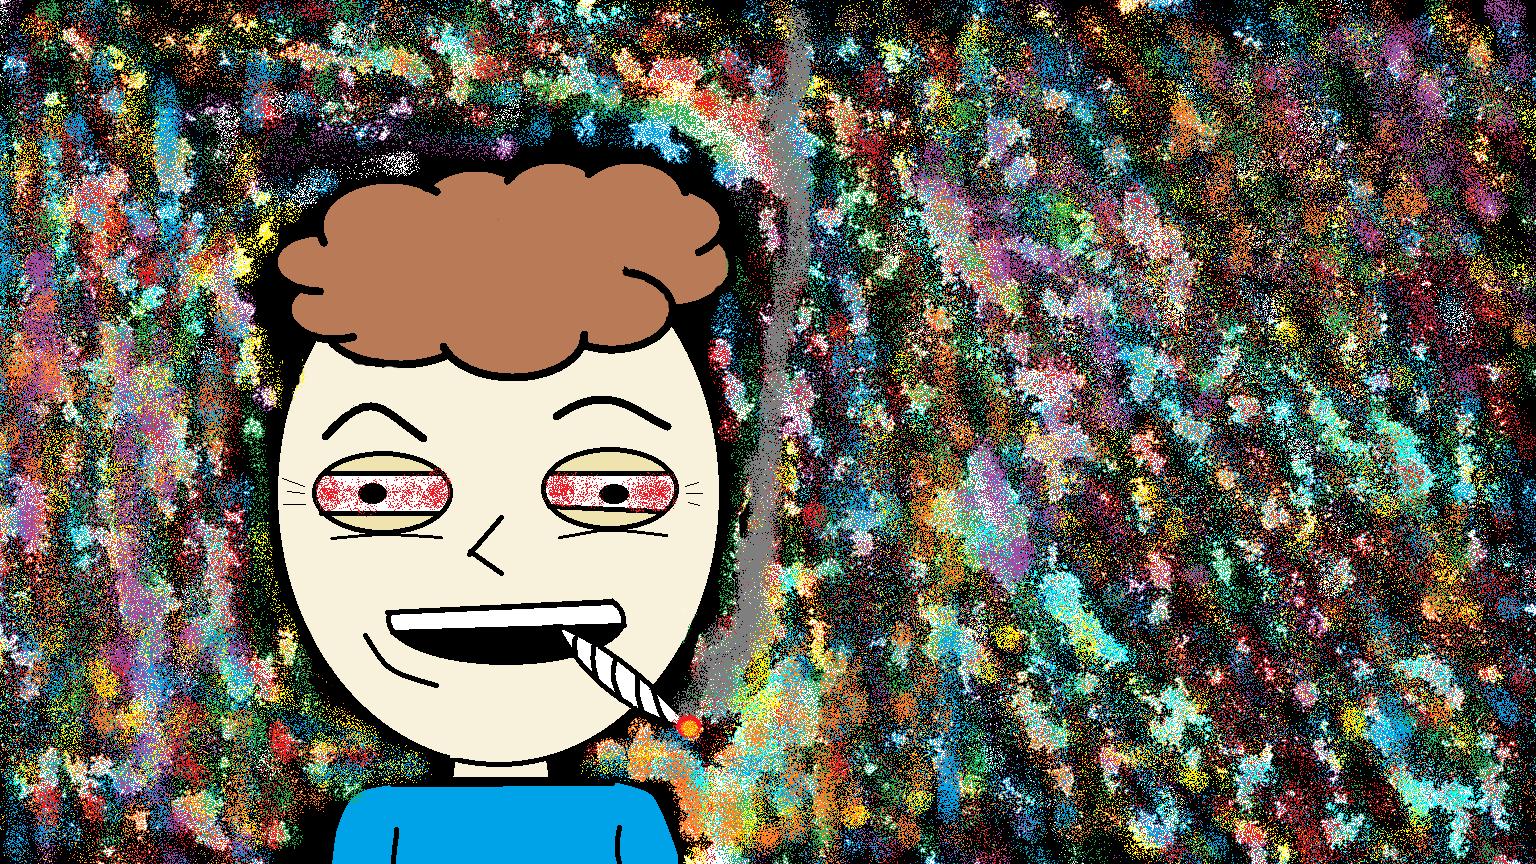 Stonederd